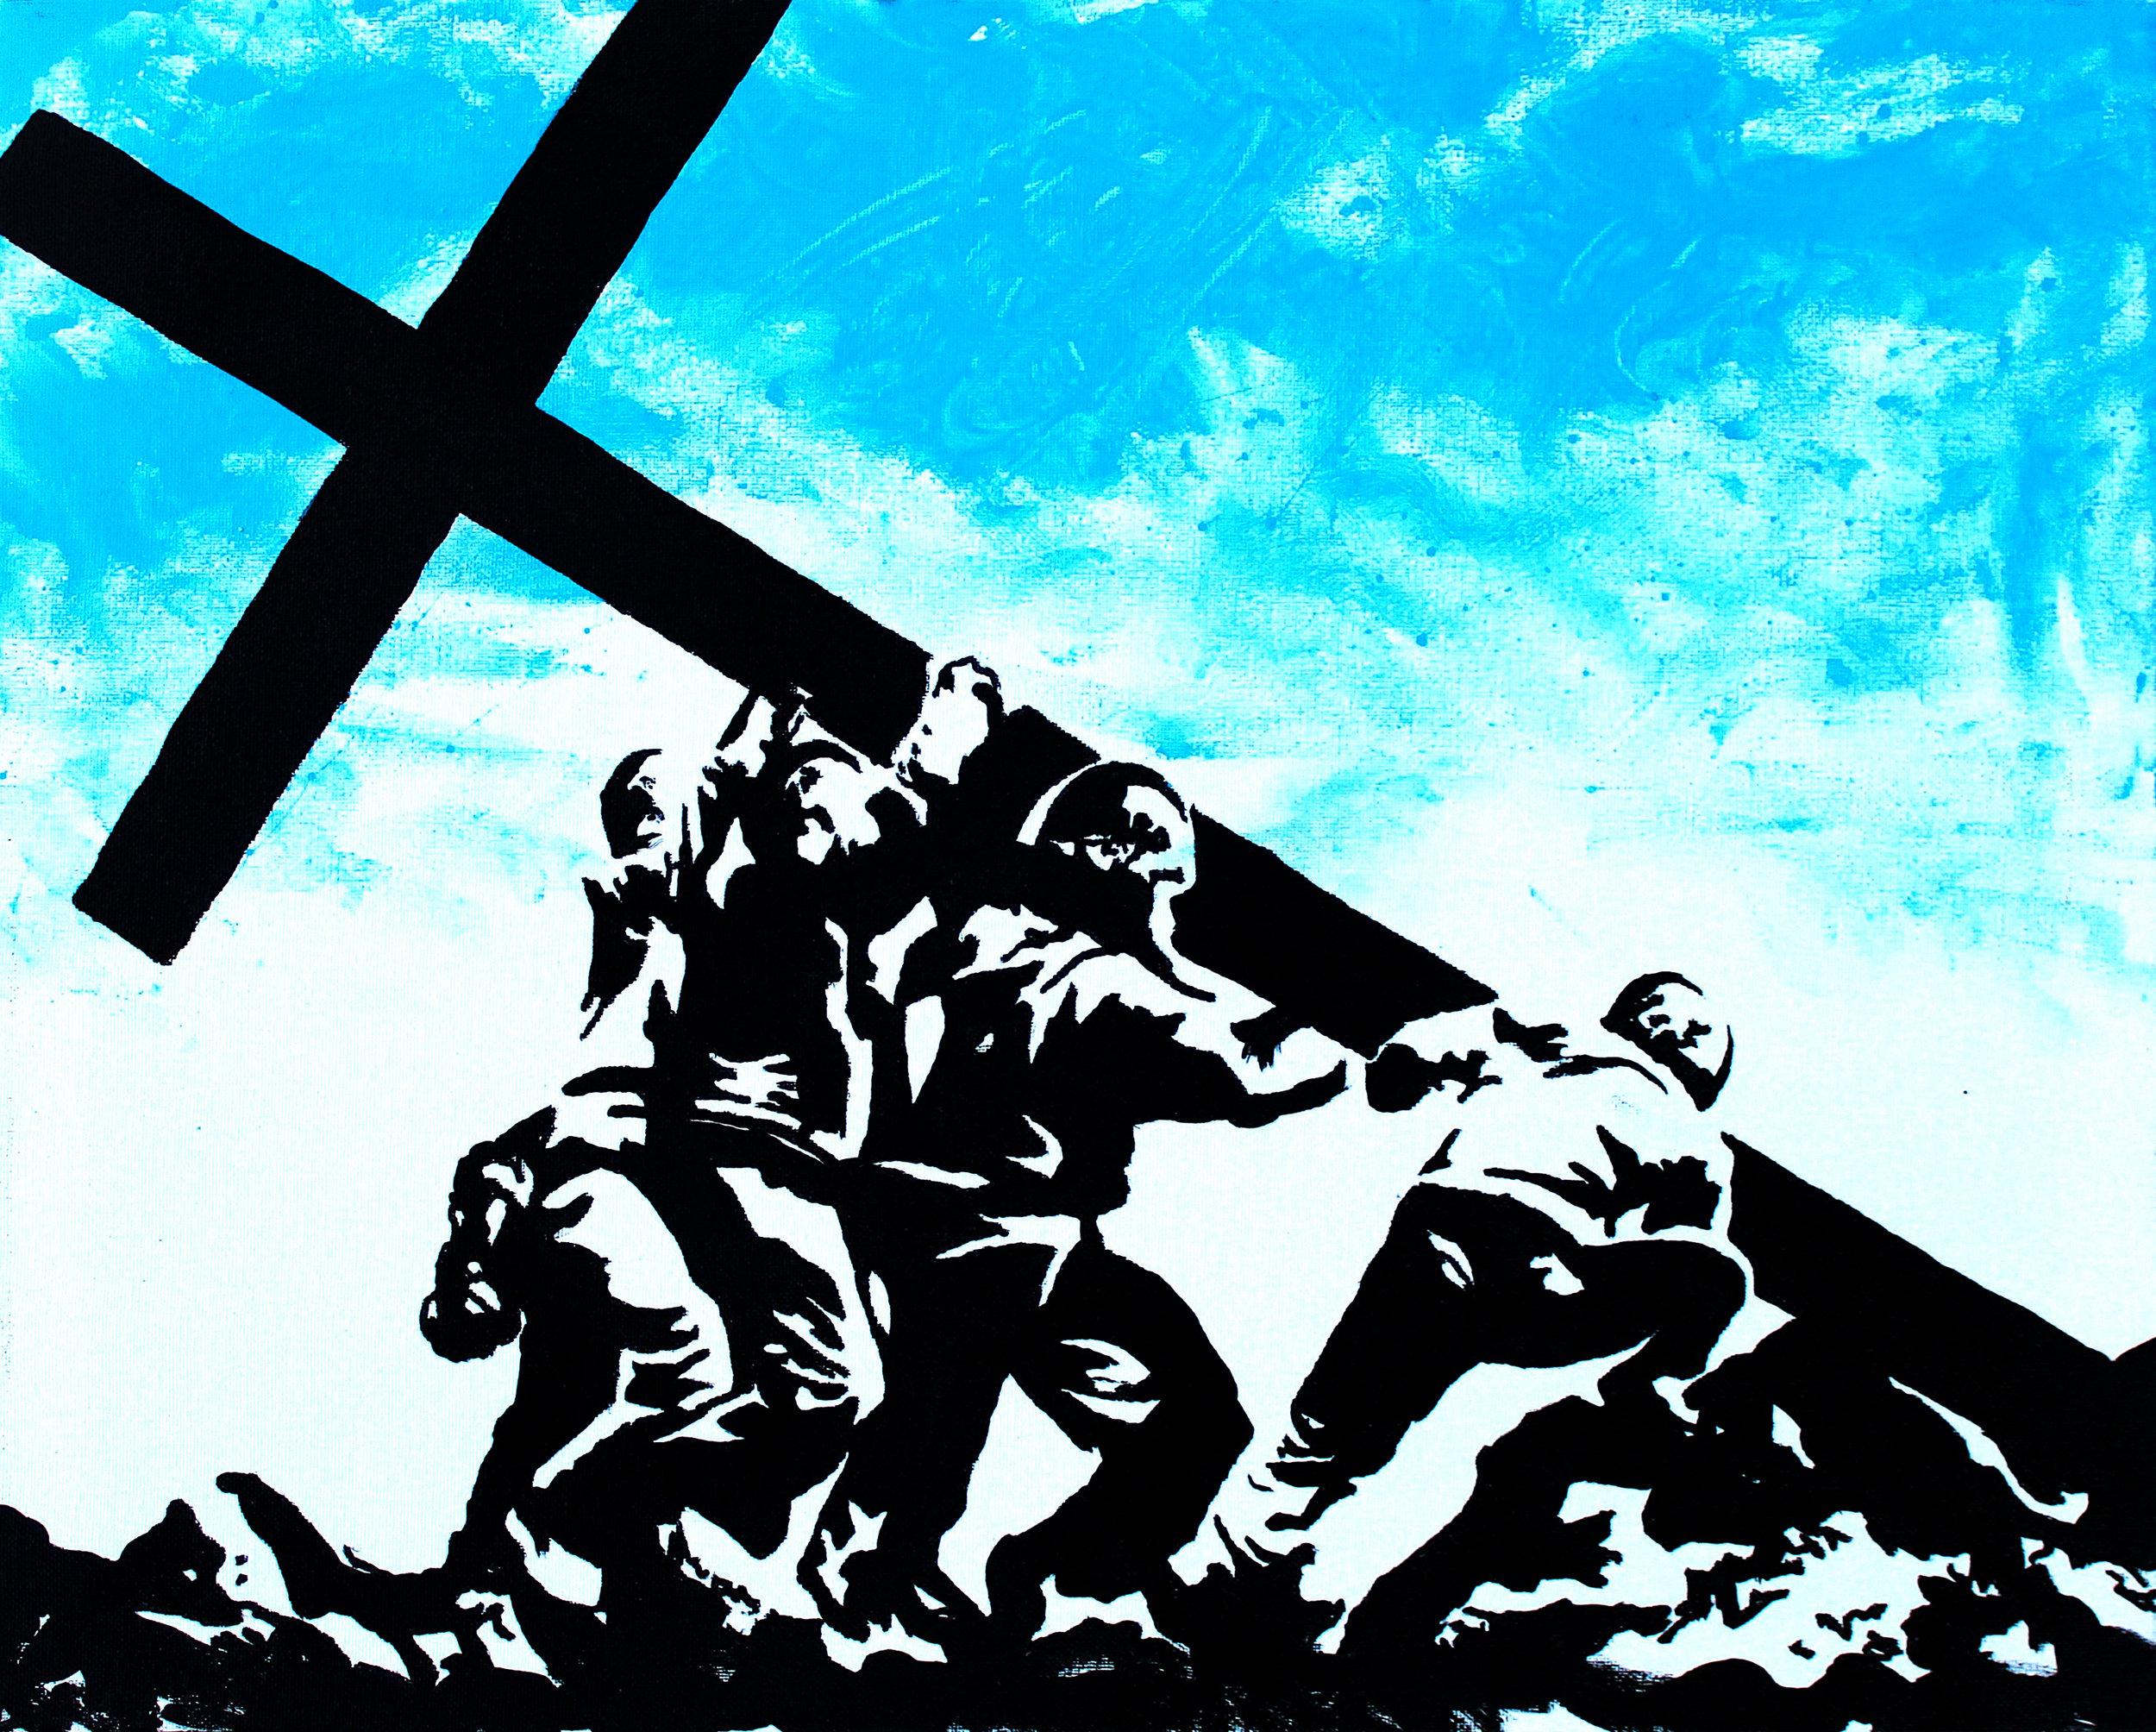 Reclaiming the Cross at Iwo Jima